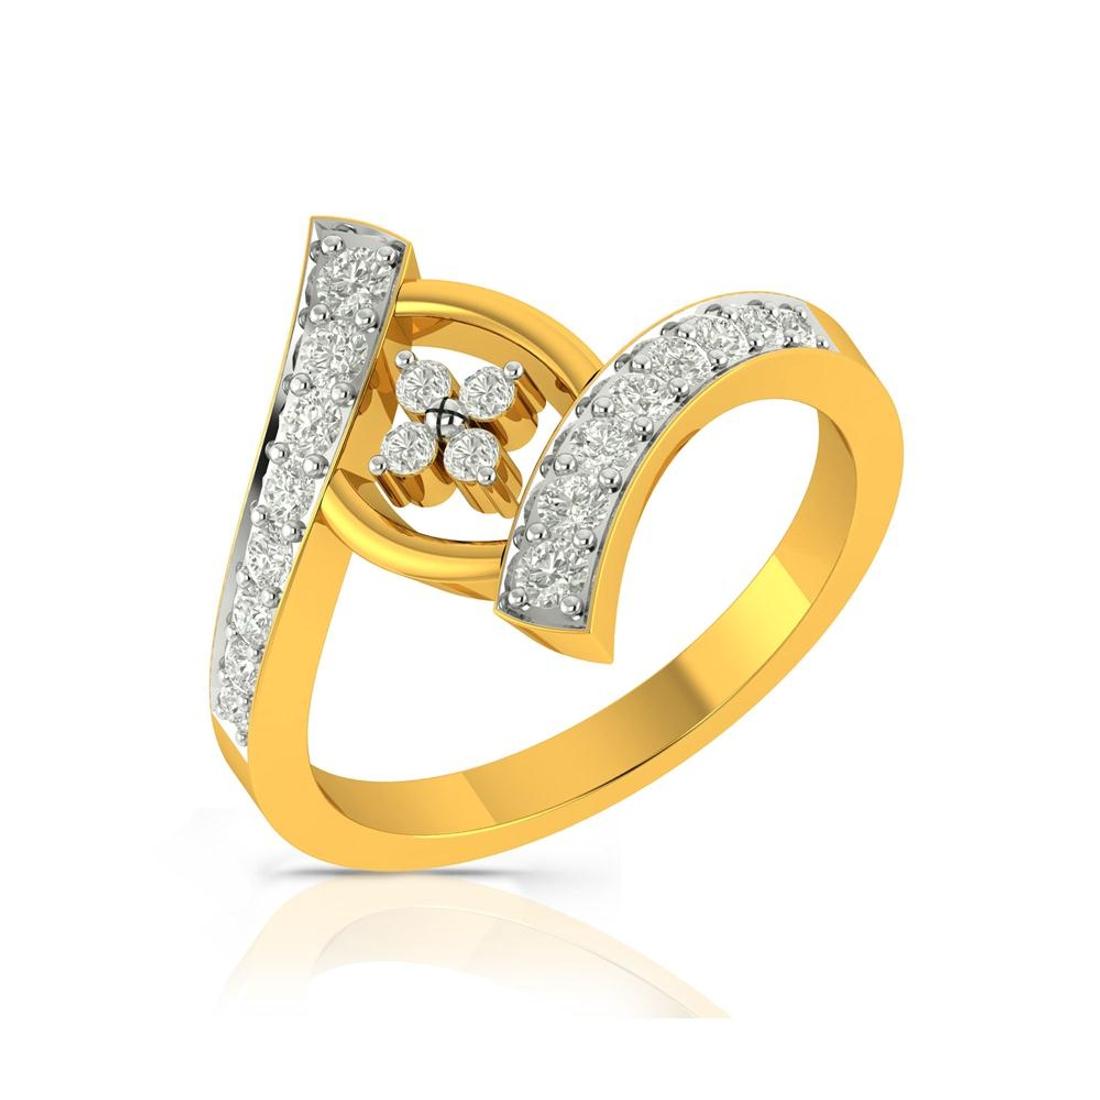 Buy Charu Jewels Diamond Ladies Ring CJLR0489 Online in India